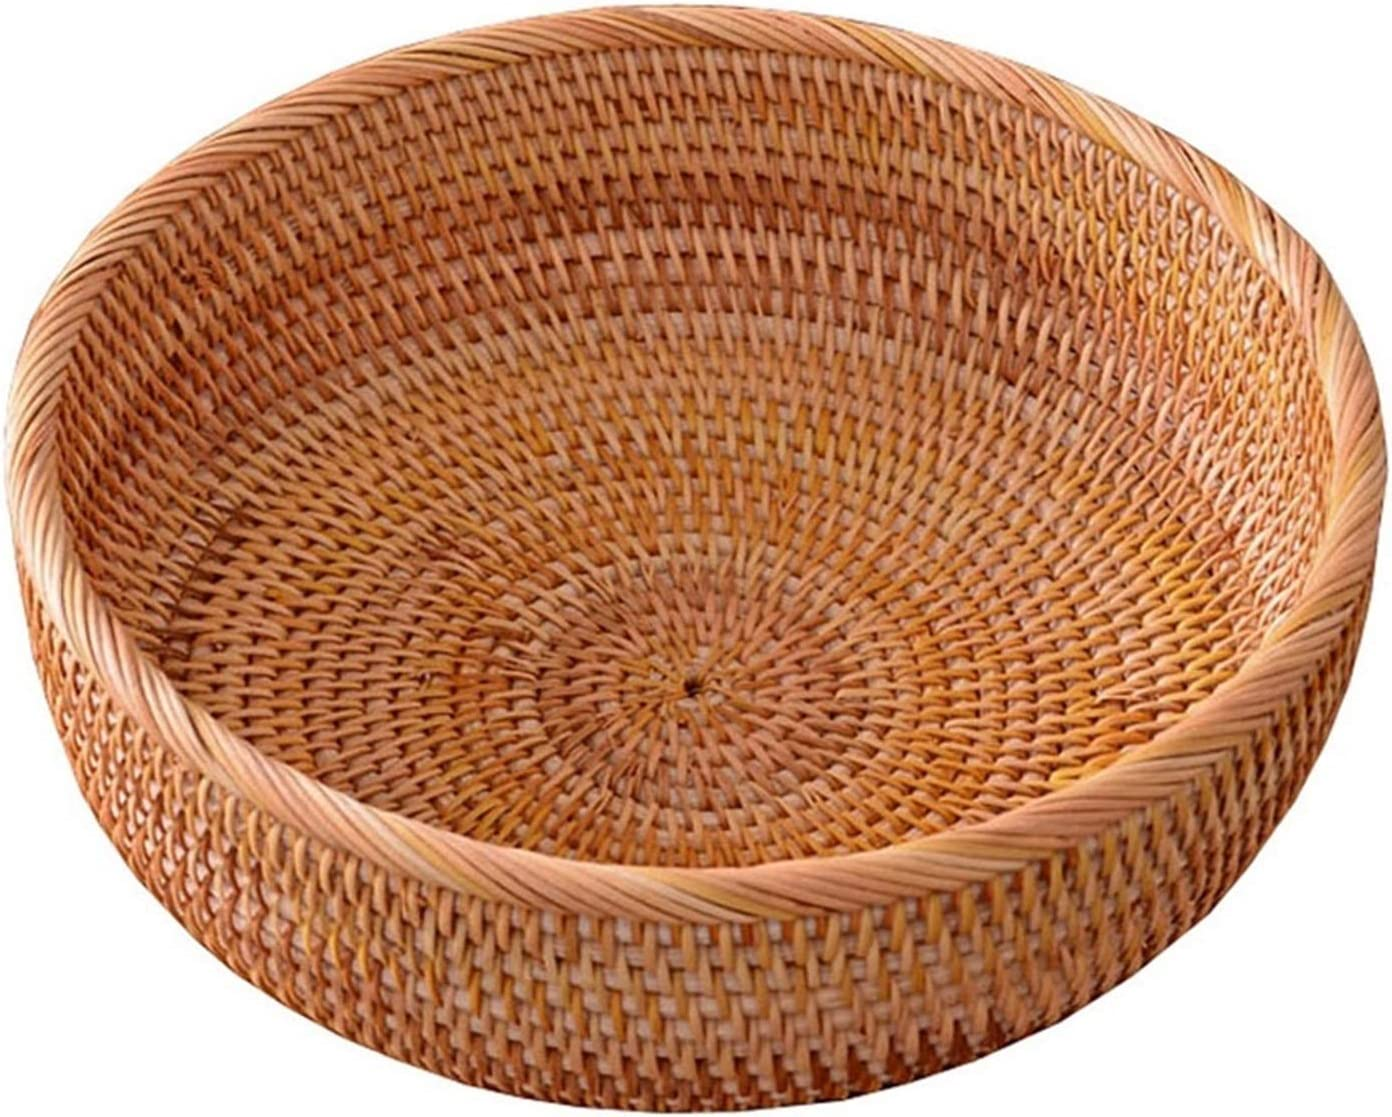 Sales pot Round Handmade Rattan Bread Basket to Store Fo List price Used Kitchen